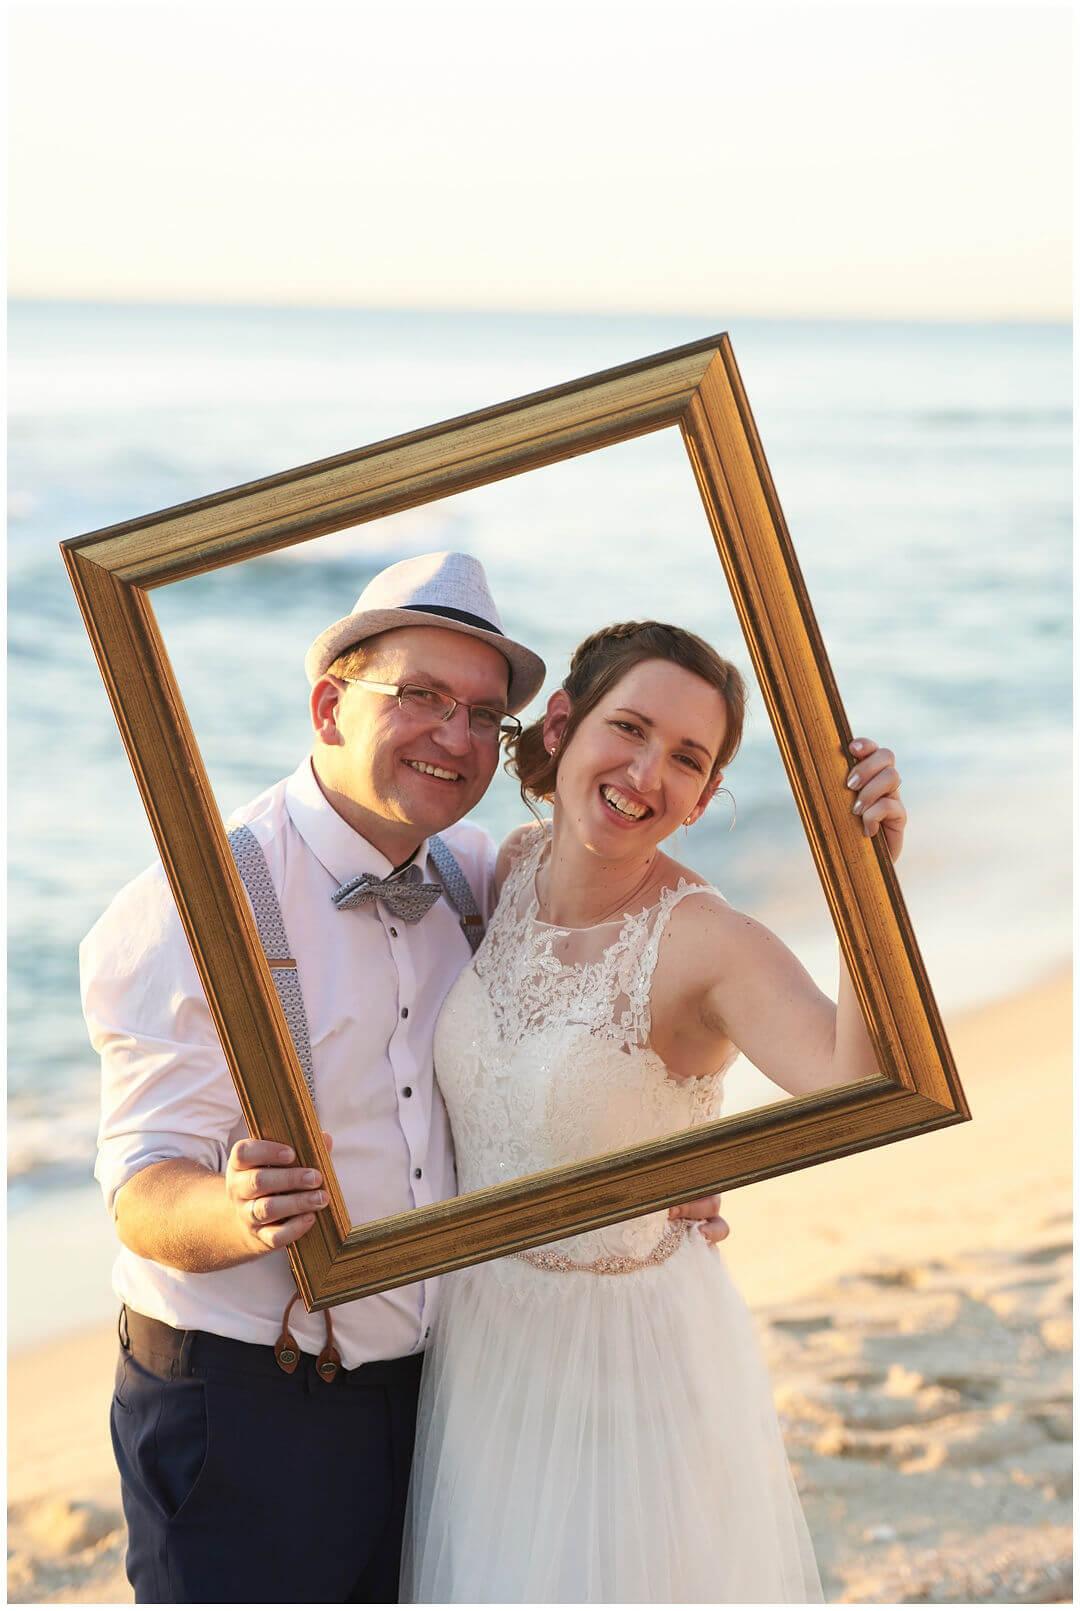 https://heirateninaustralien.com/wp-content/uploads/2020/07/Isabelle-Marcus-1.jpg